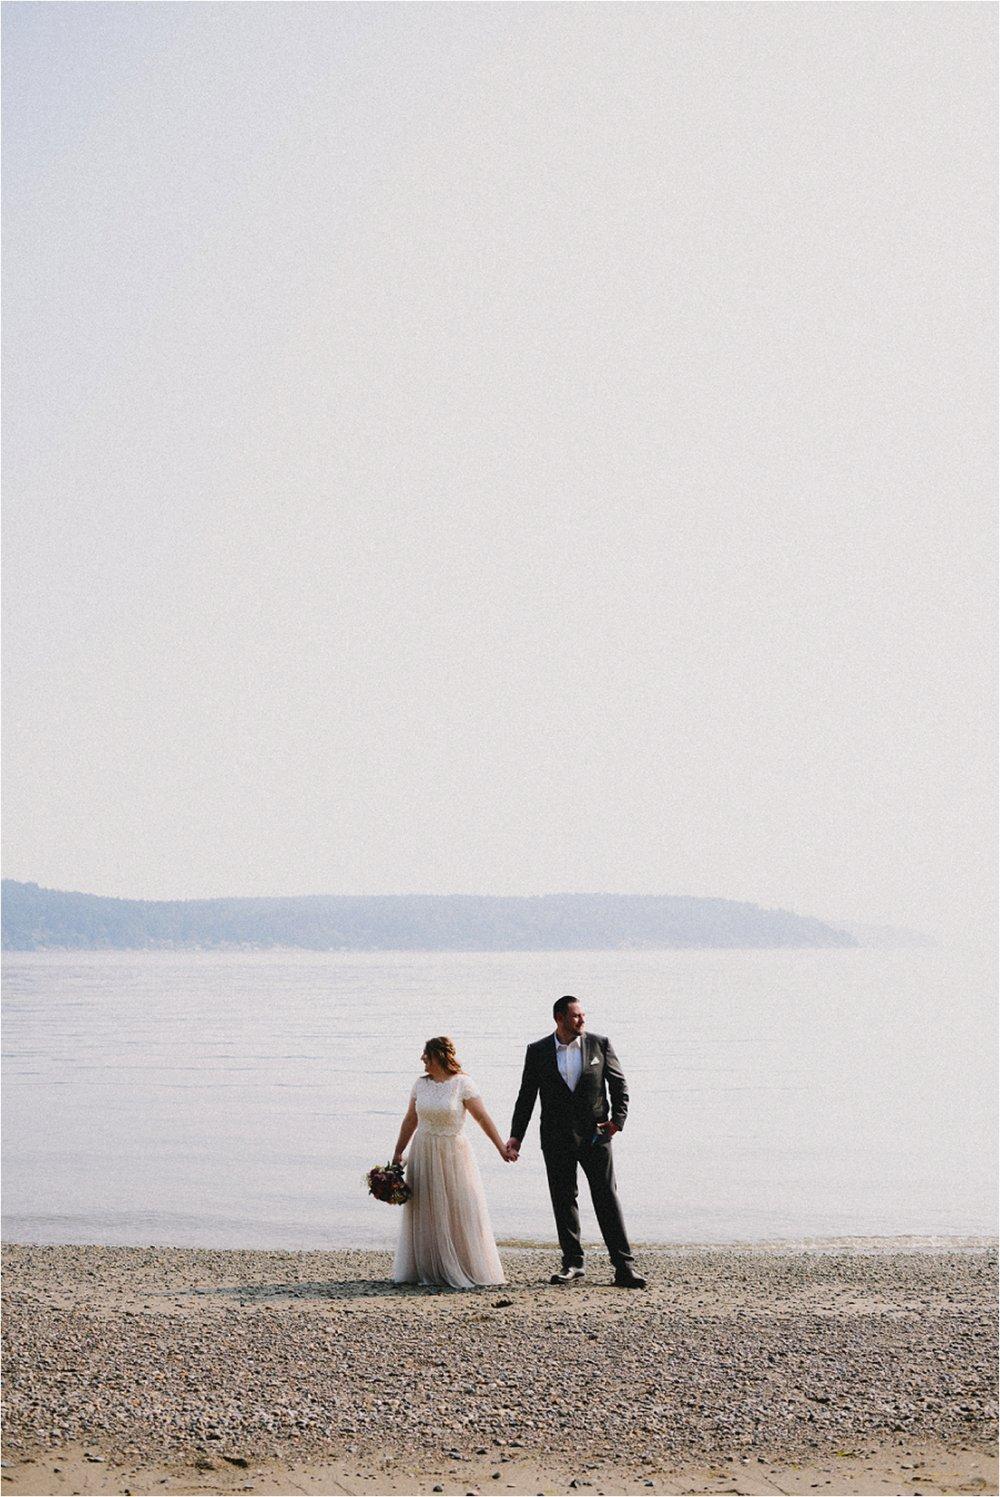 owen-beach-priest-point-park-tacoma-washington-elopement-jannicka-mayte-anchorage-alaska-wedding-elopement-photographer (14).jpg